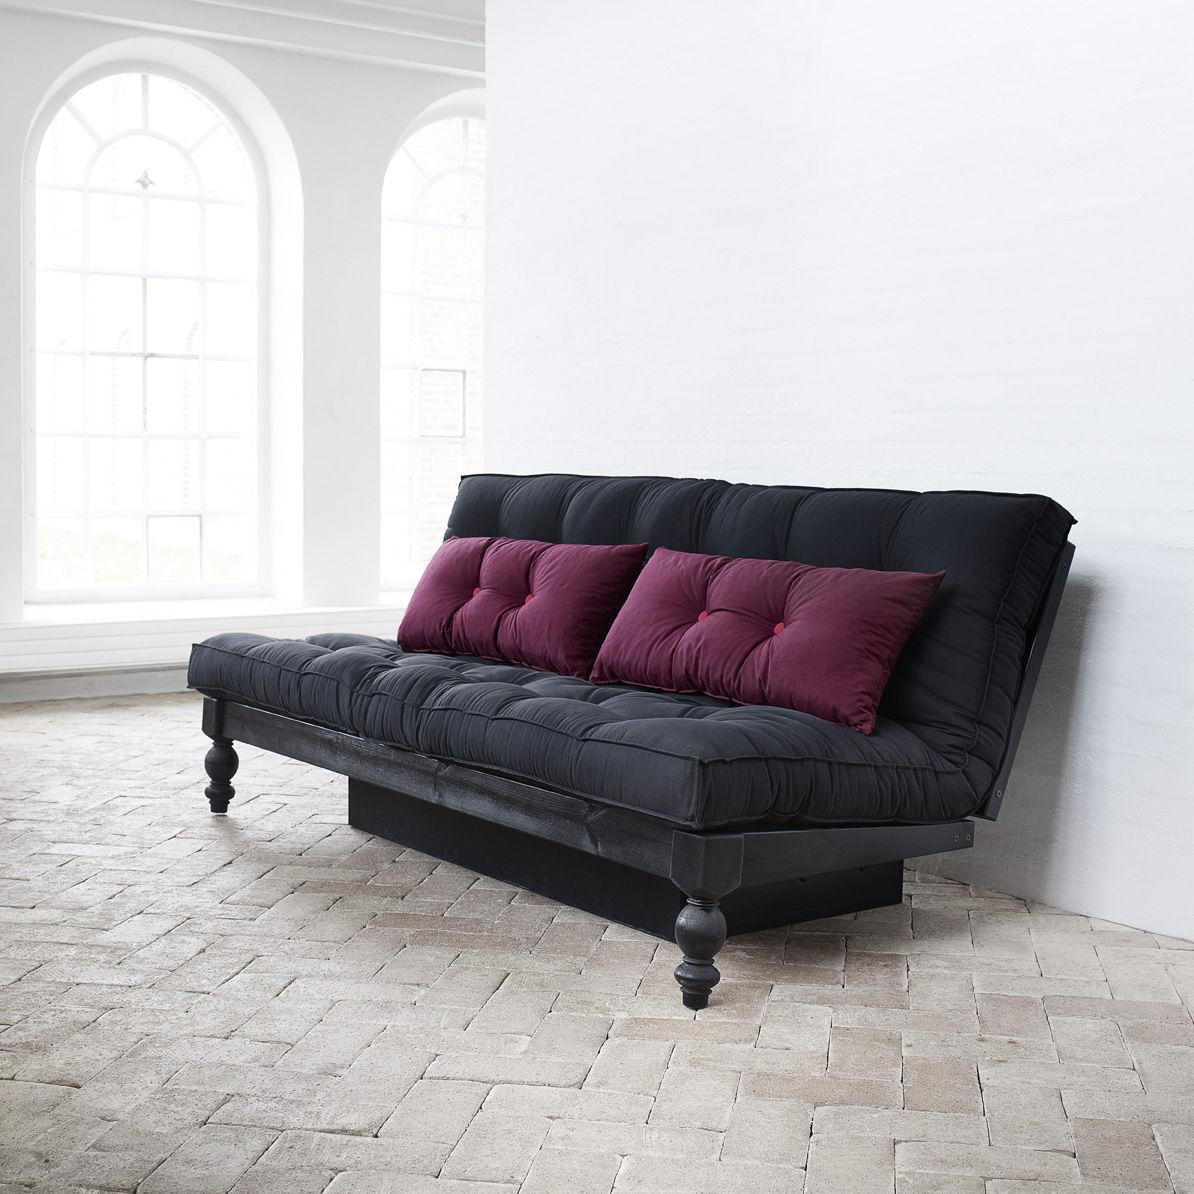 sofa bed   contemporary   wooden   3 seater   rock o sofa bed   contemporary   wooden   3 seater   rock o   karup      rh   archiexpo